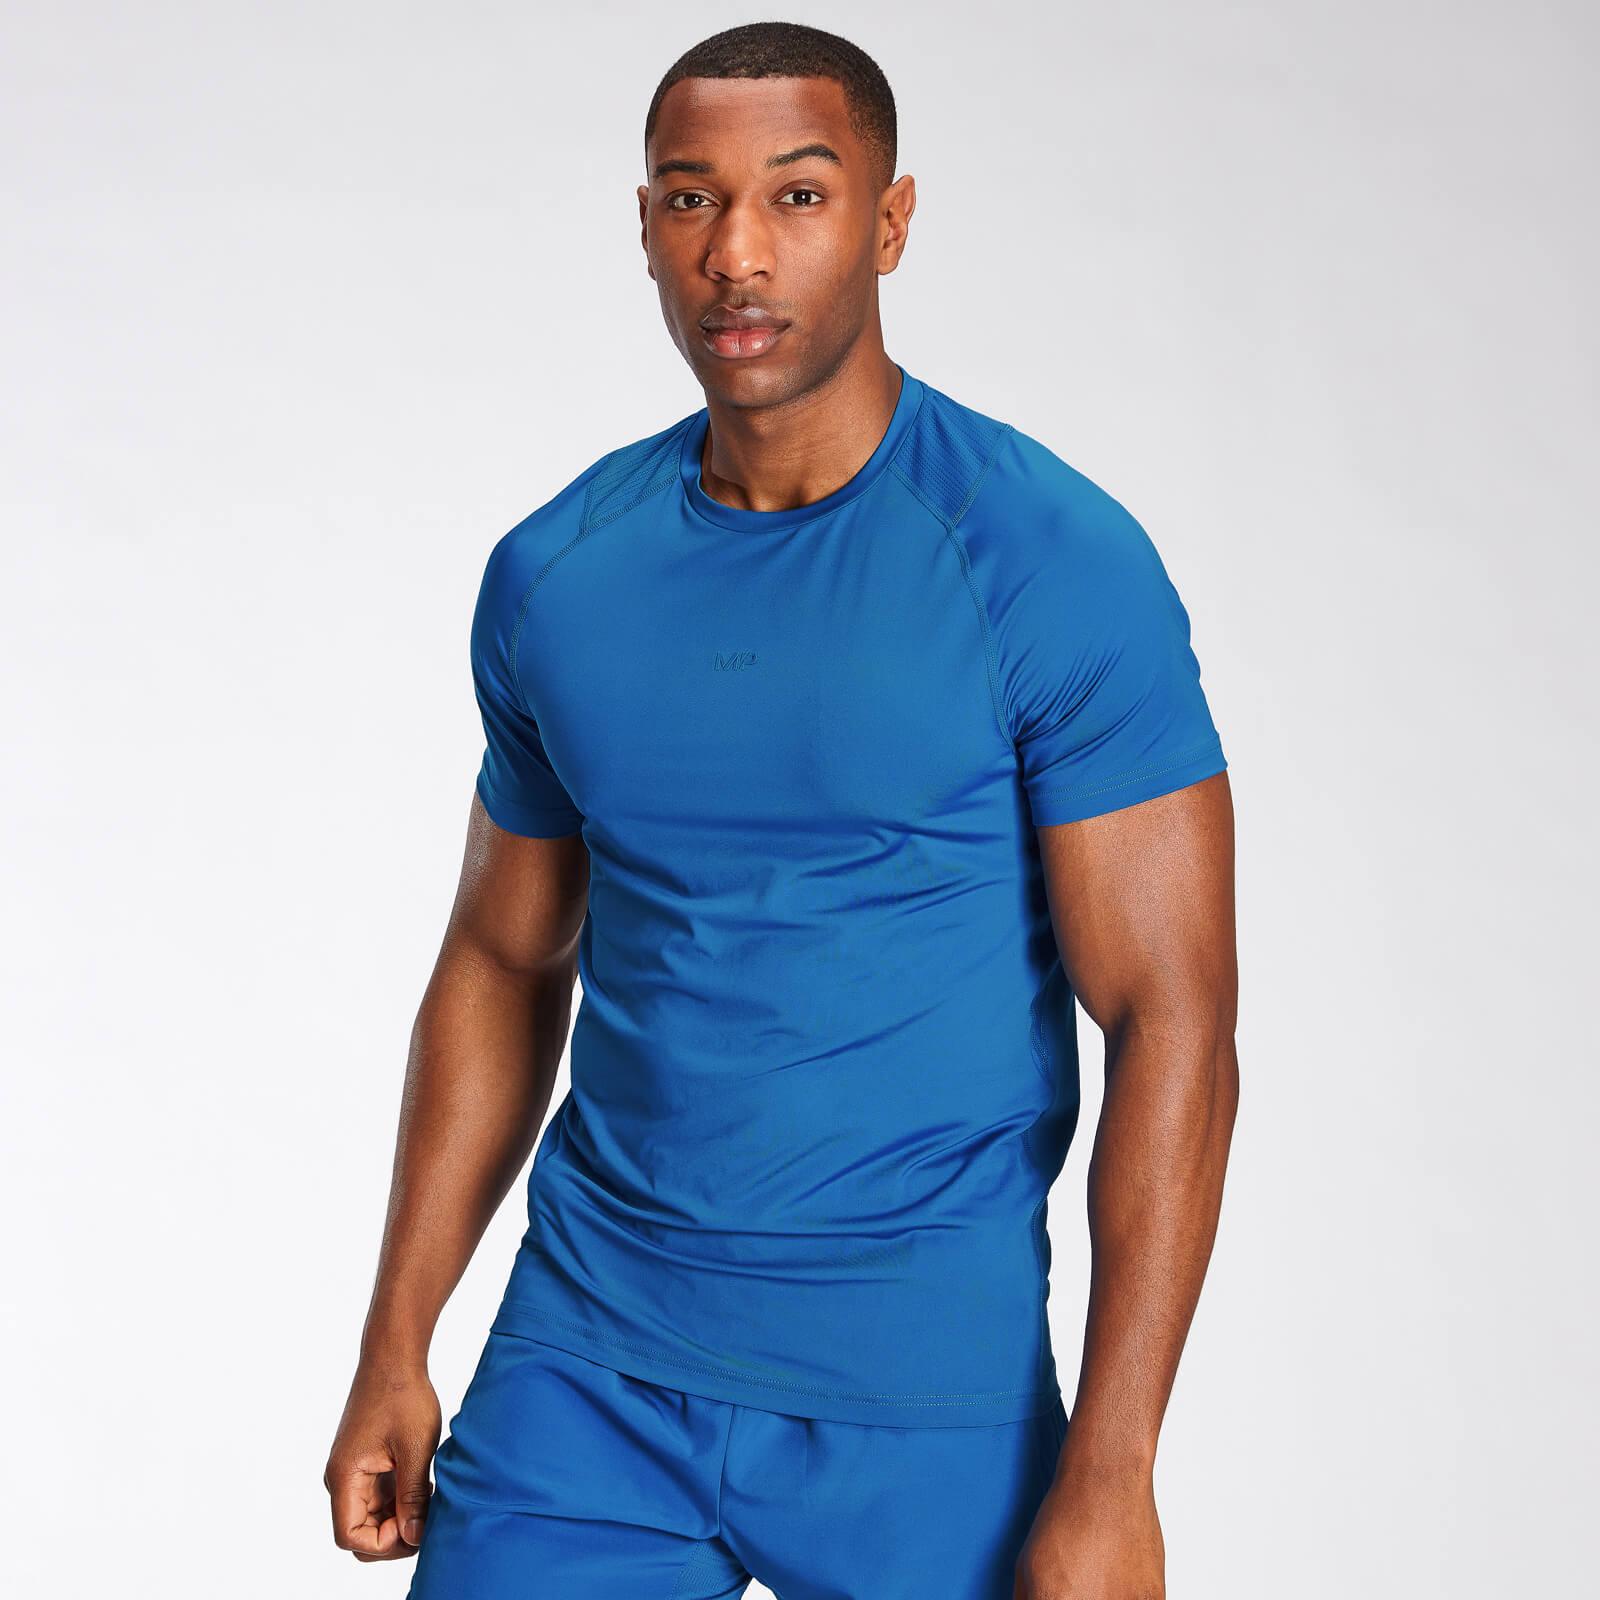 Купить MP Men's Engage Short Sleeve T-Shirt - True Blue - XL, Myprotein International